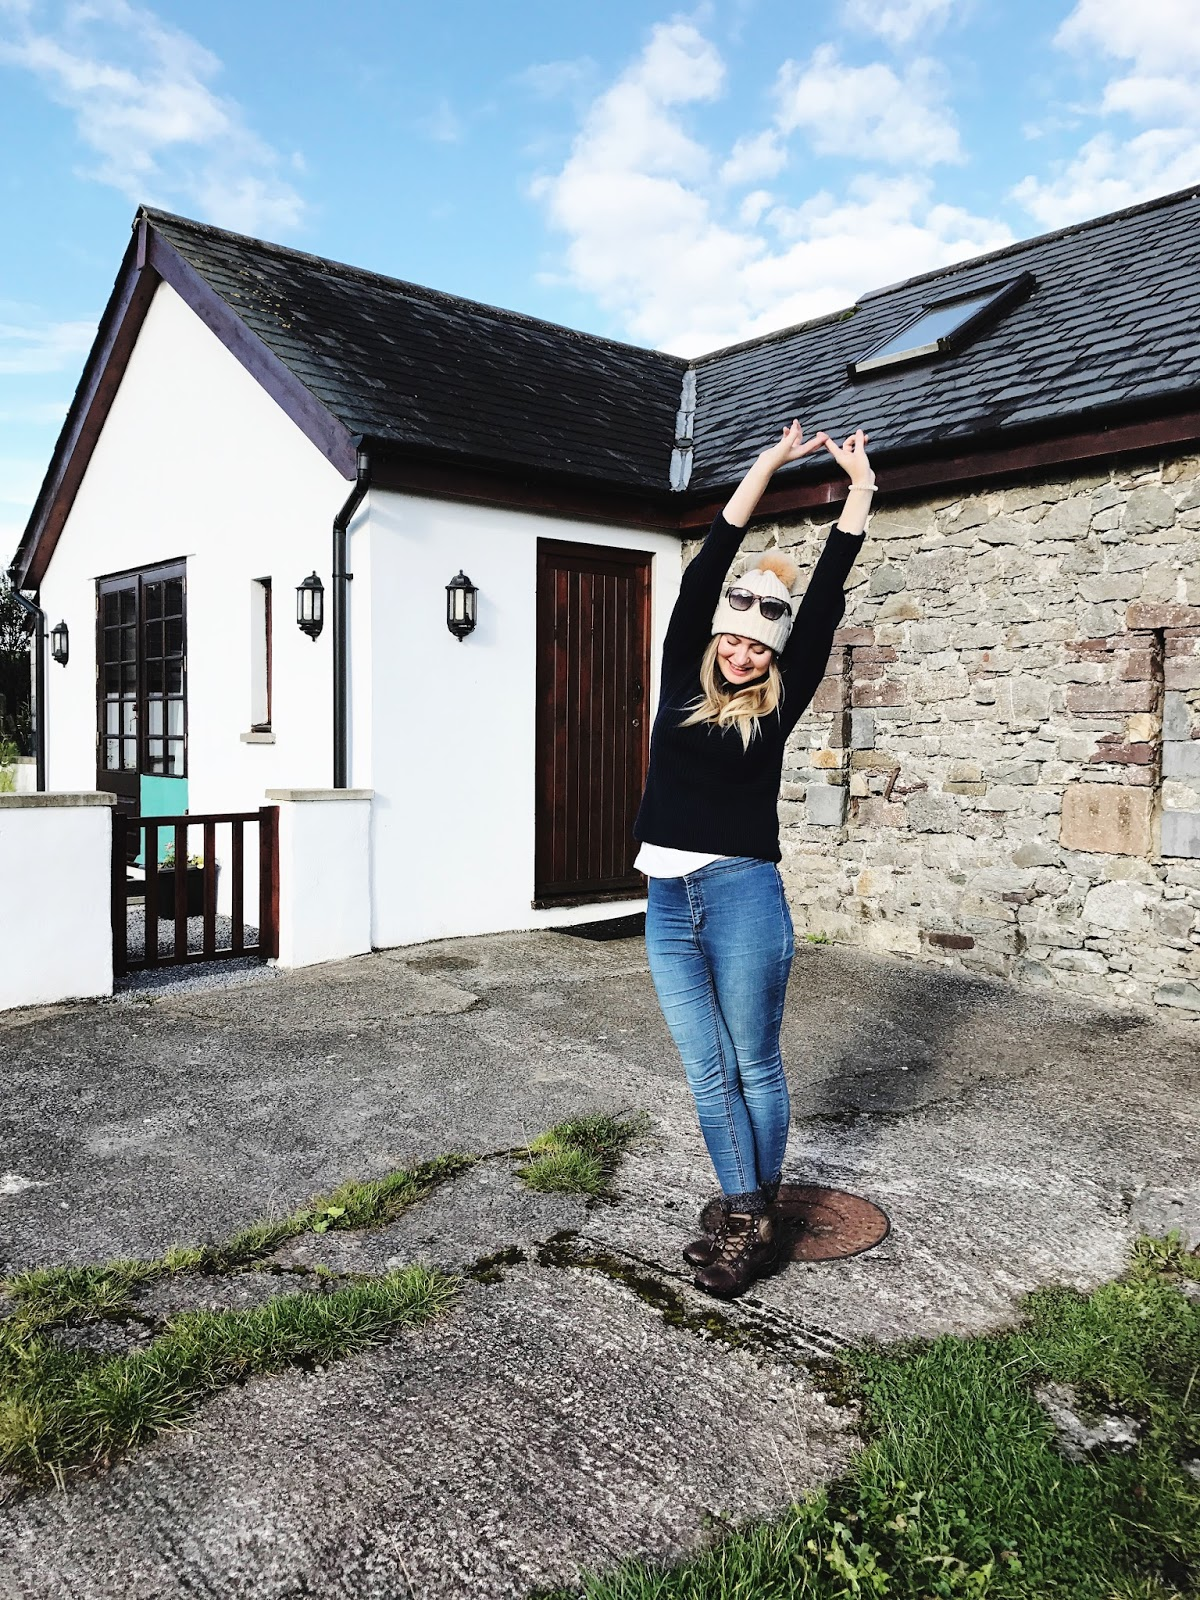 Brecon Beacons travel blog, lifestyle blog, UK travel blog, Dalry Rose Blog